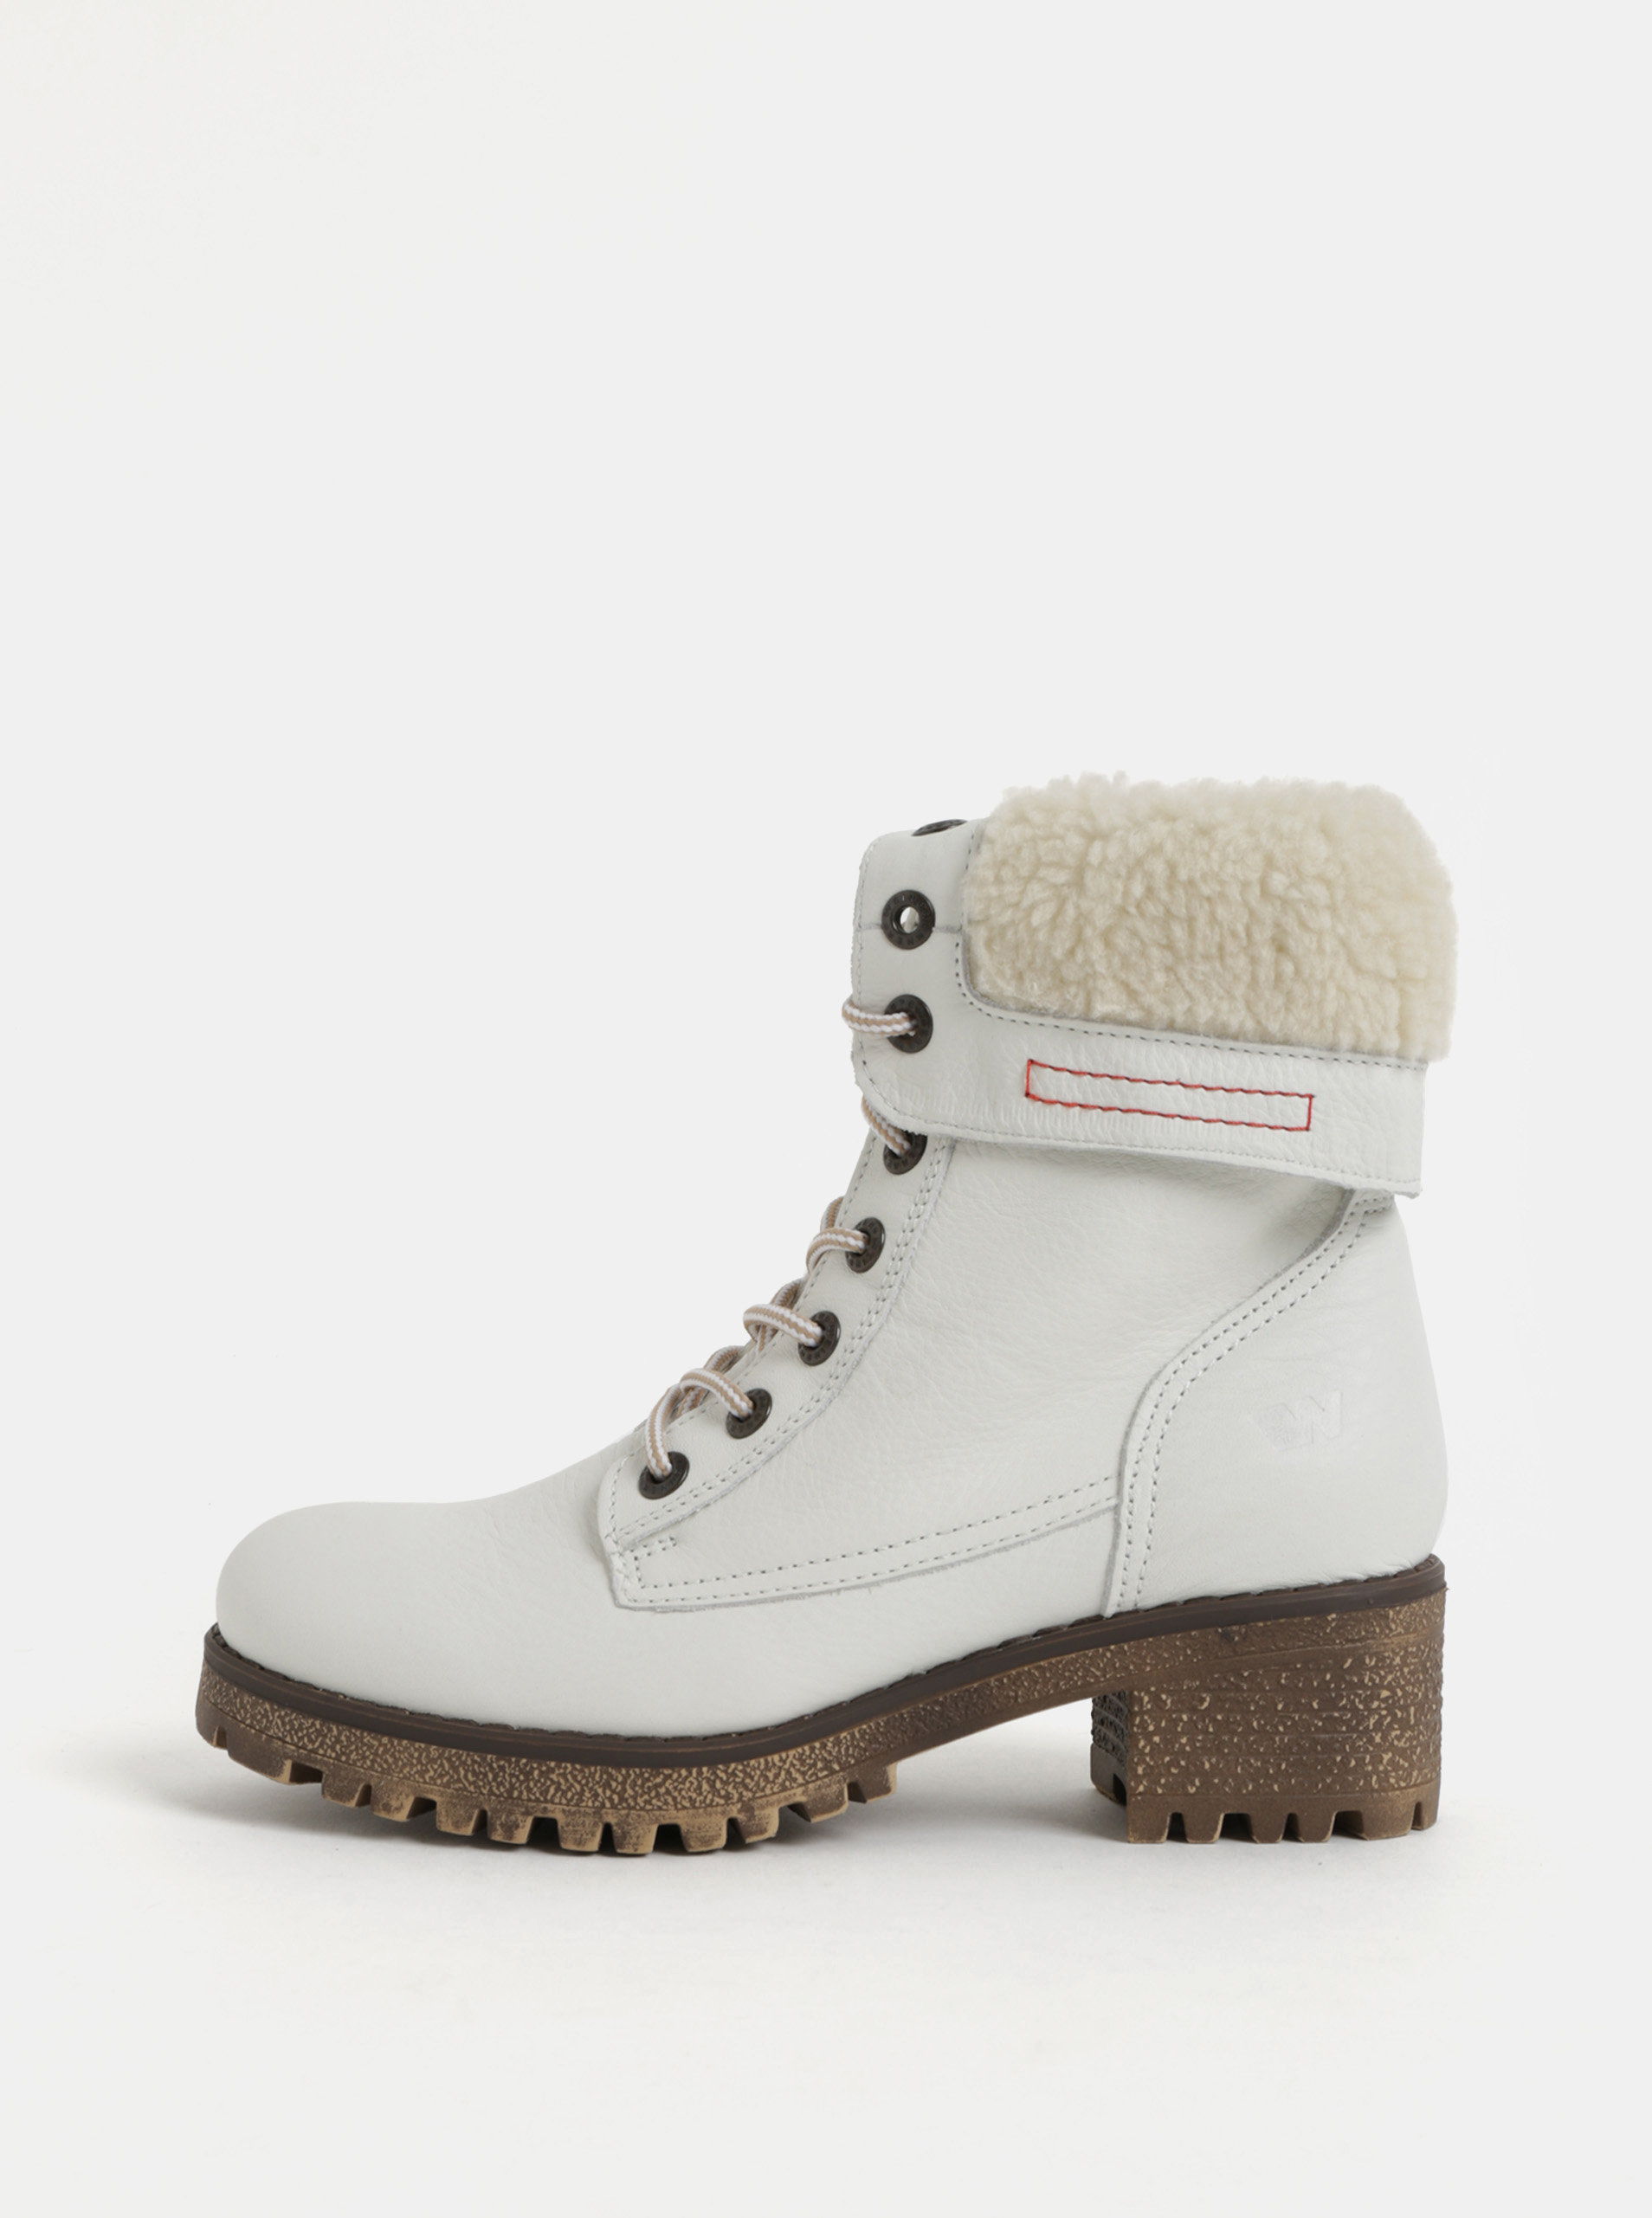 Biele dámske kožené členkové zimné topánky na podpätku Weinbrenner ... 2fc28df012c